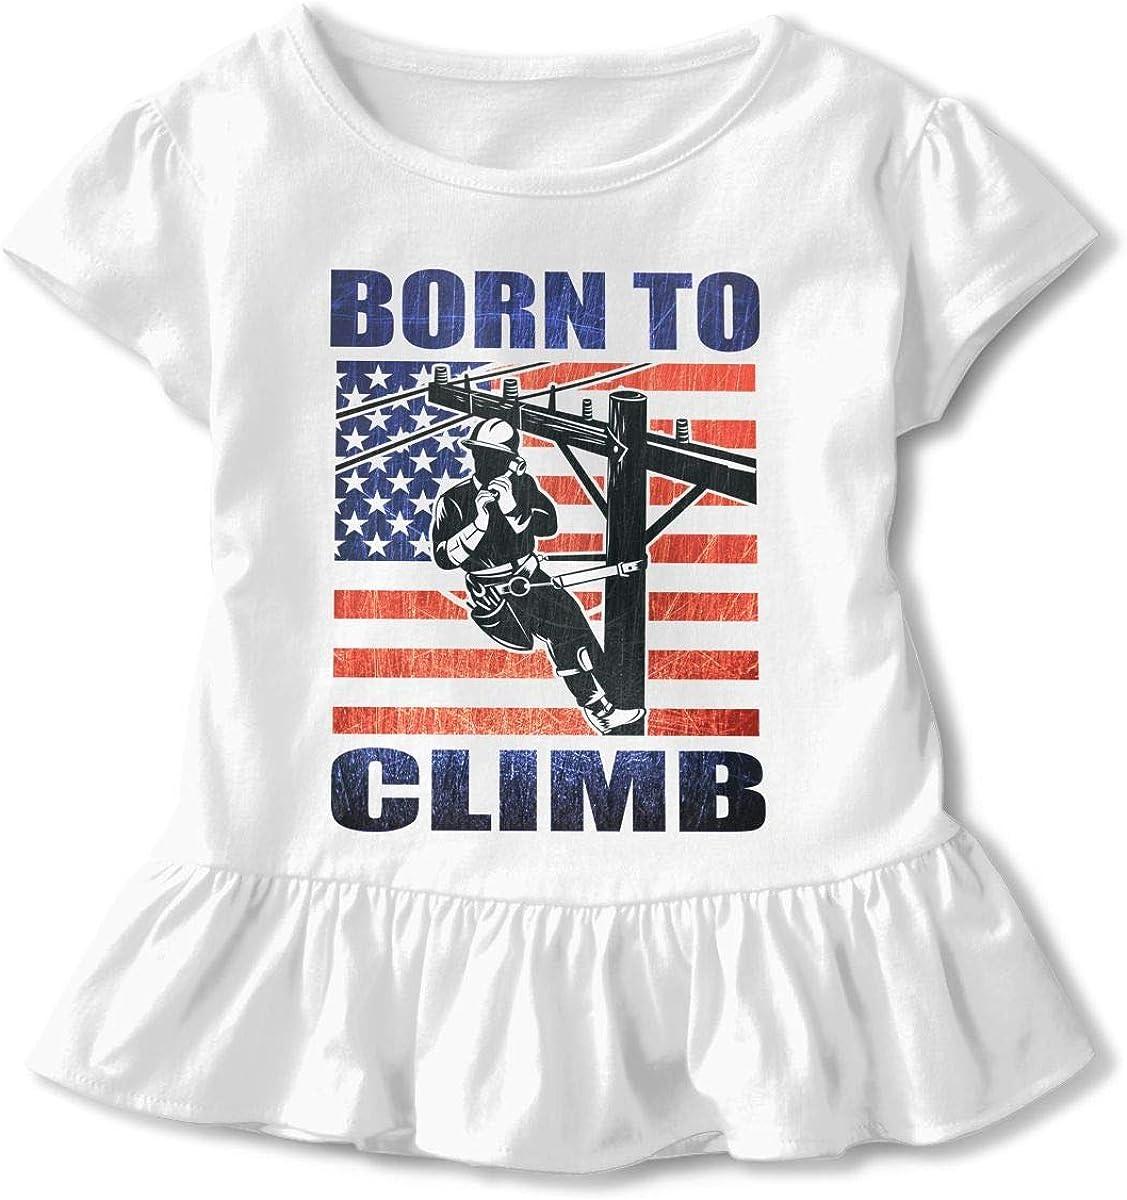 Cheng Jian Bo Lineman American Flag Toddler Girls T Shirt Kids Cotton Short Sleeve Ruffle Tee